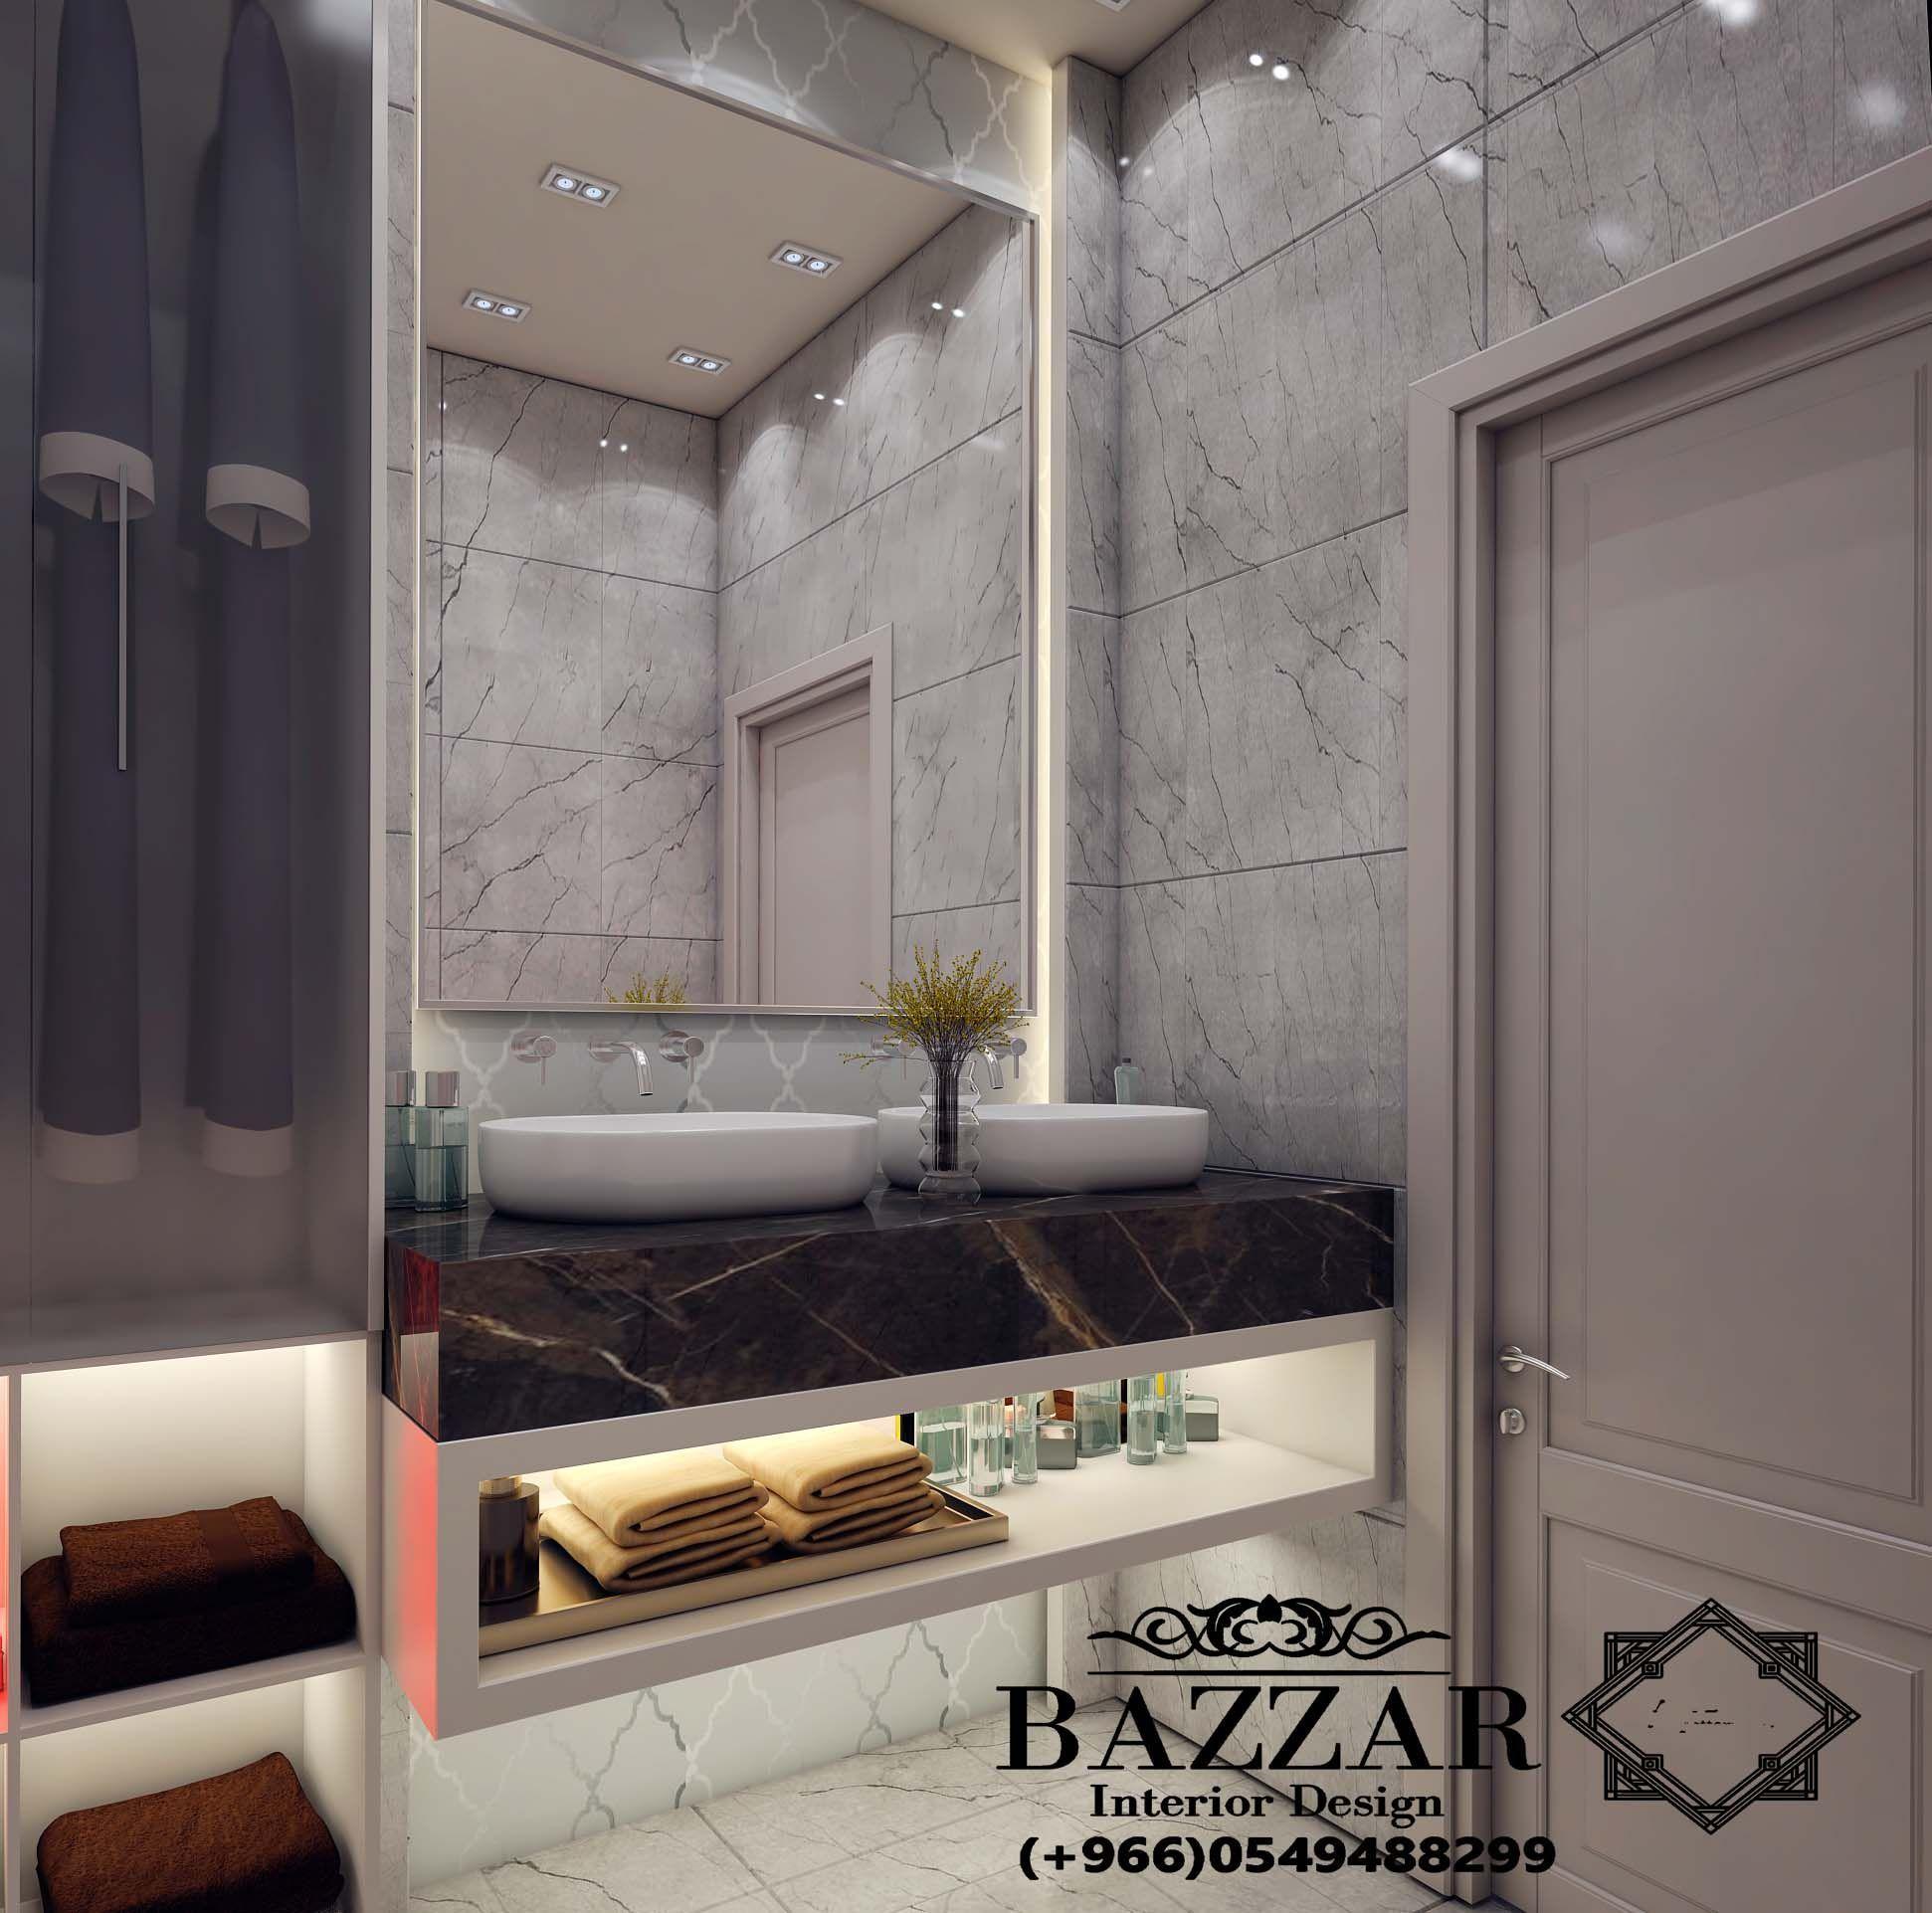 تصميم حمام مودرن تصميم ديكور حمام باللون الابيض تصميم حمام ذات الوان هادئه تصميم حمام صغيره Bathro Diy Bathroom Decor Bathroom Design Small Bathroom Decor